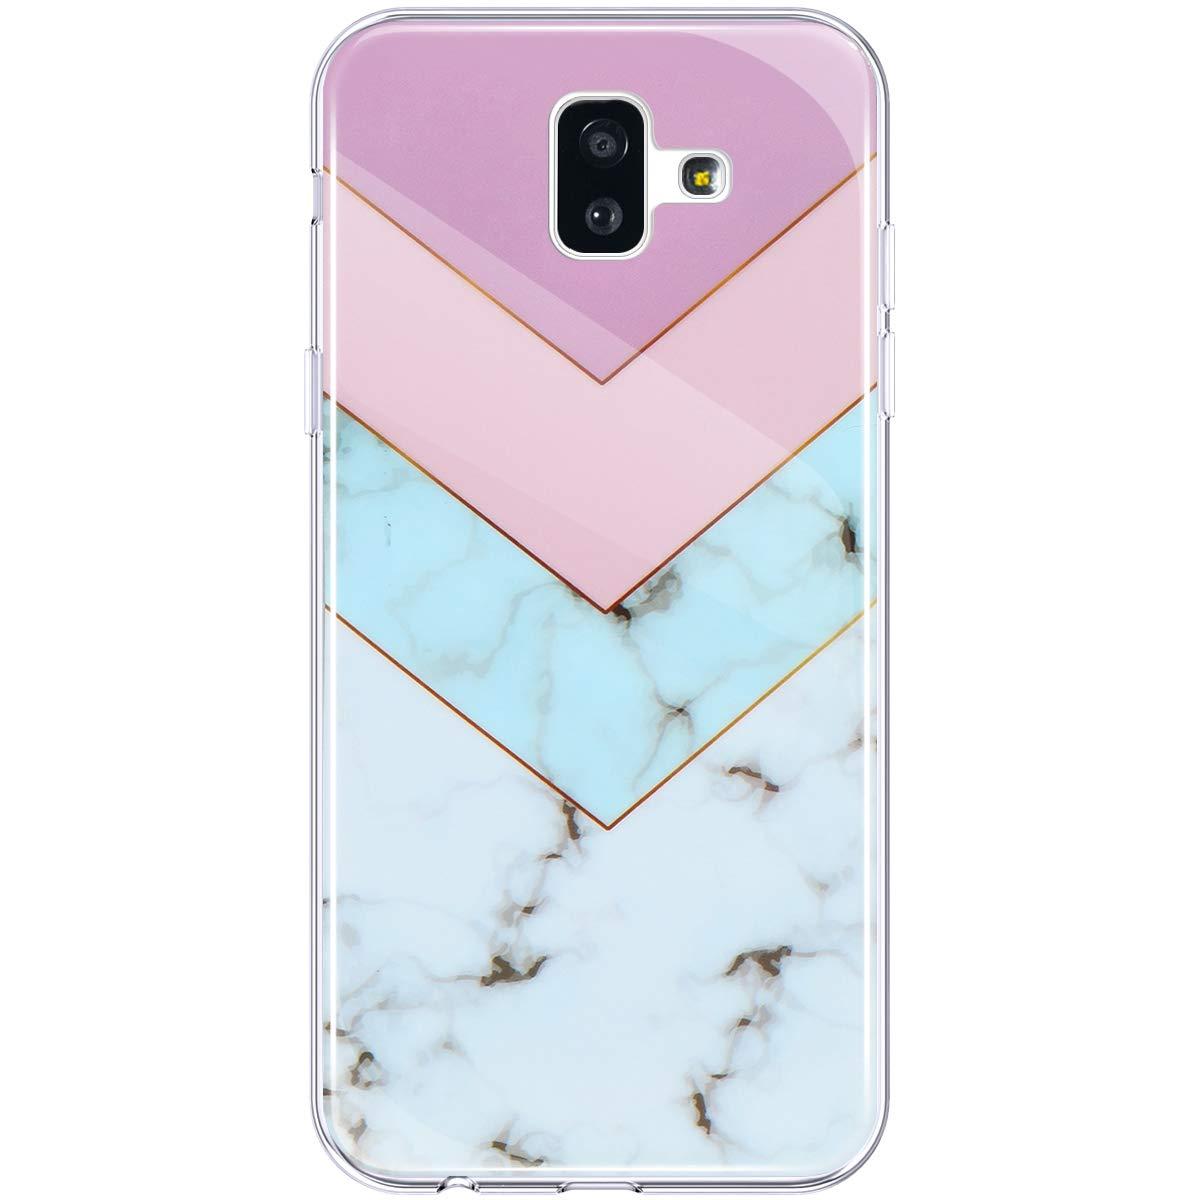 Handyh/ülle Samsung Galaxy J6 Plus Marmor Muster D/ünn Weiche TPU Silikon Transparent Bumper Schale Sto/ßfest Case Cover Tasche Etui Schutzh/ülle Hpory Kompatibel mit Galaxy J6 Plus H/ülle Wei/ß Braun